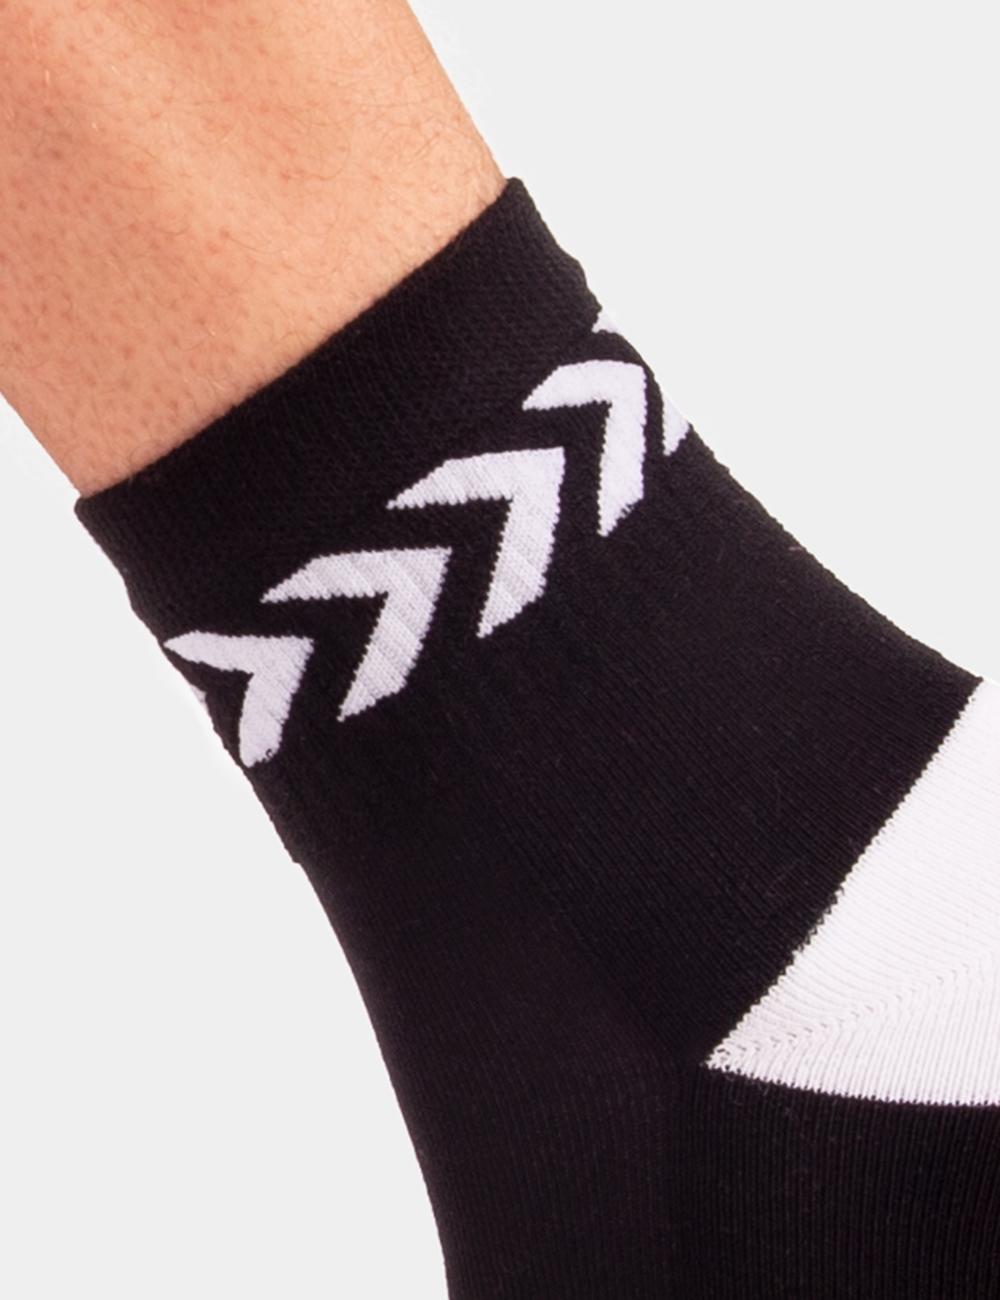 Barcode Berlin Petty Socks | Black|White